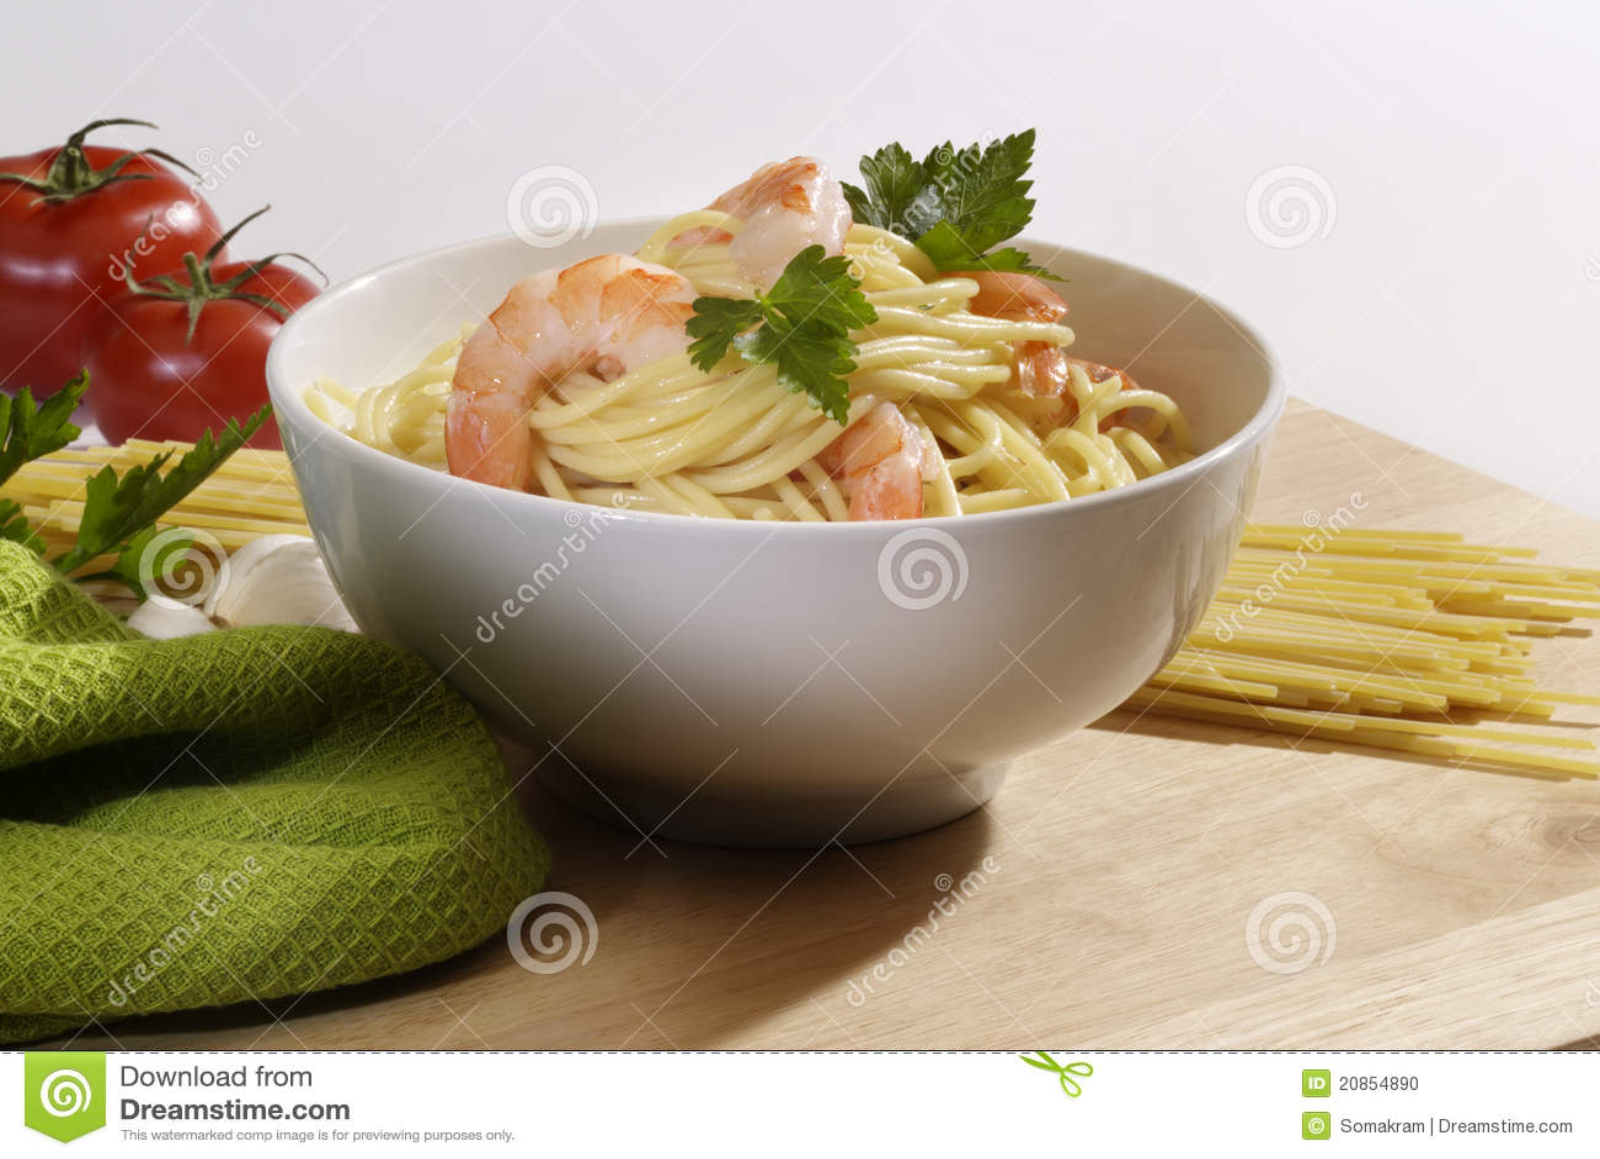 Krewetka spaghetti